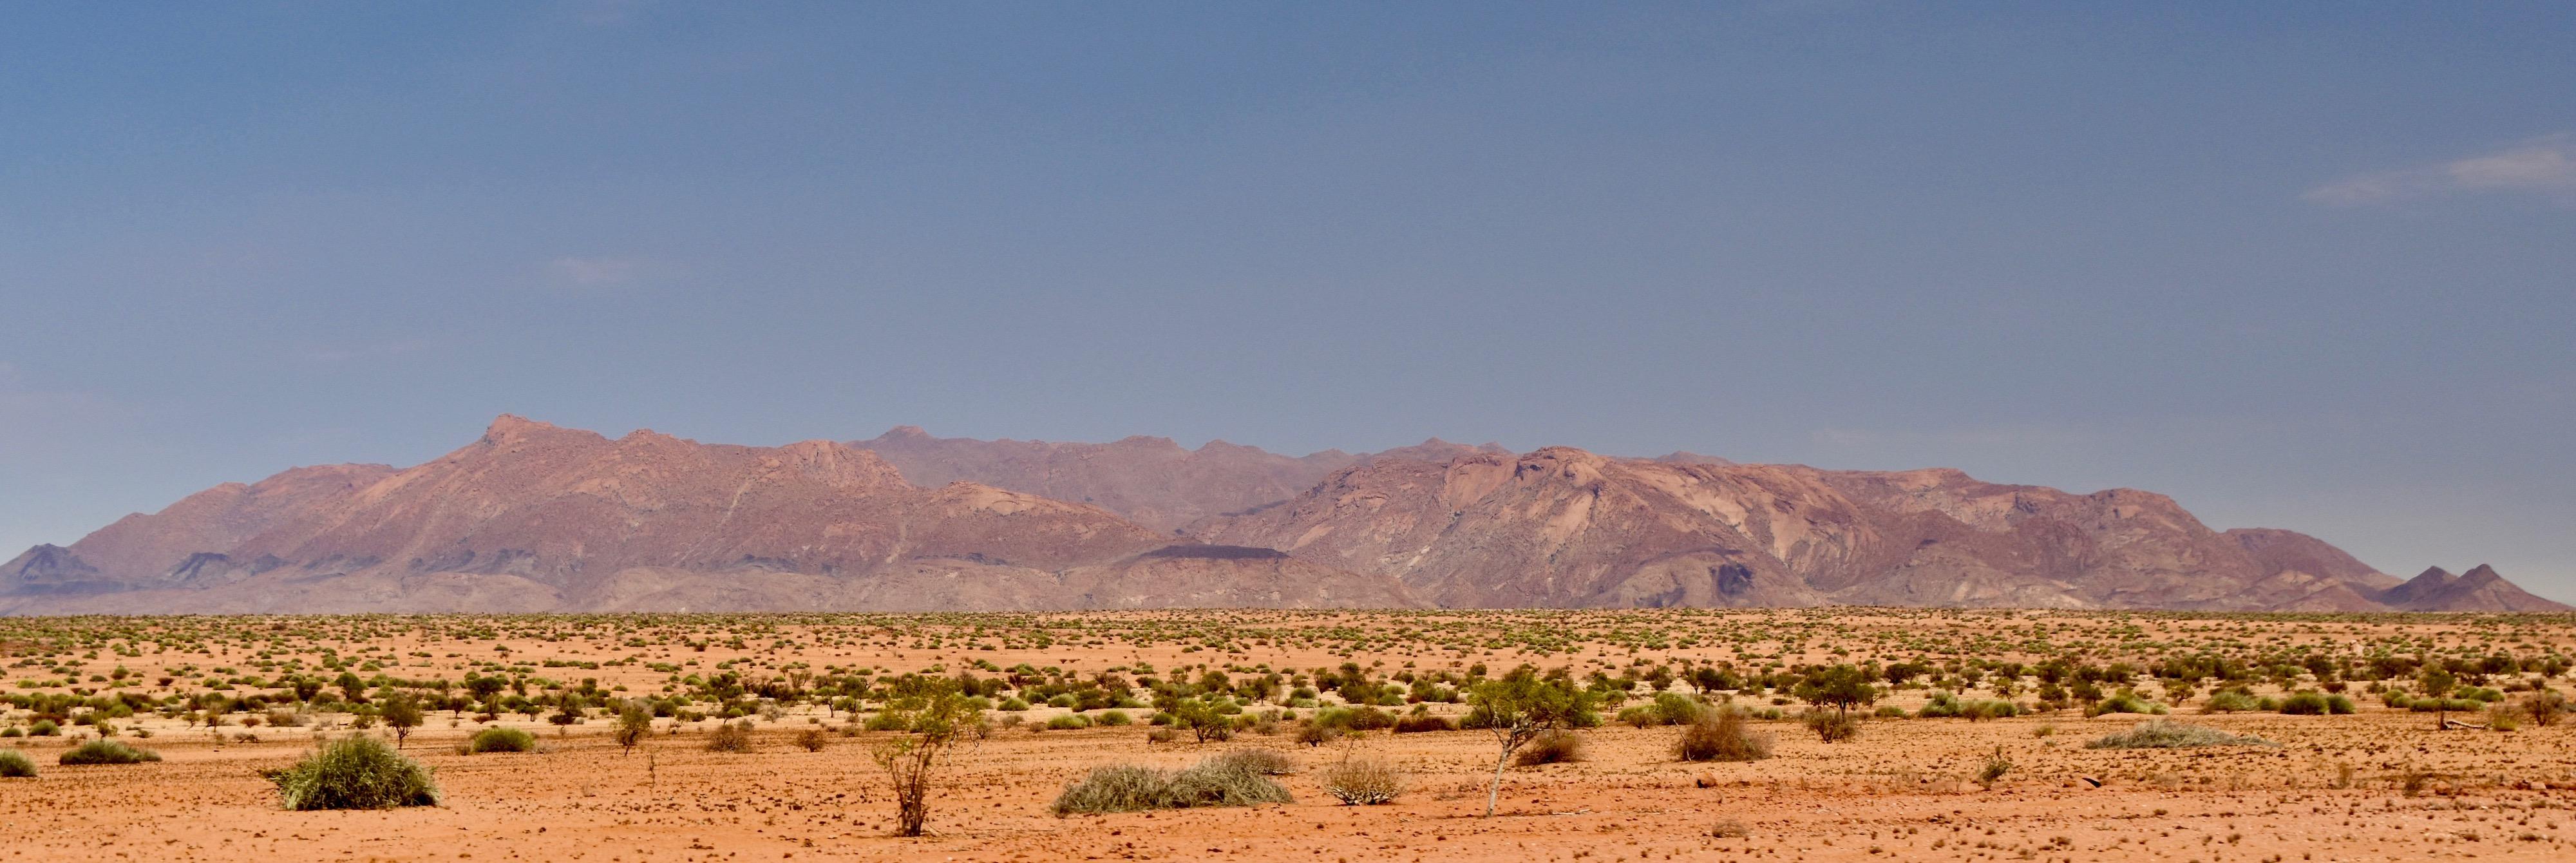 Exploring Namibia - Brandberg